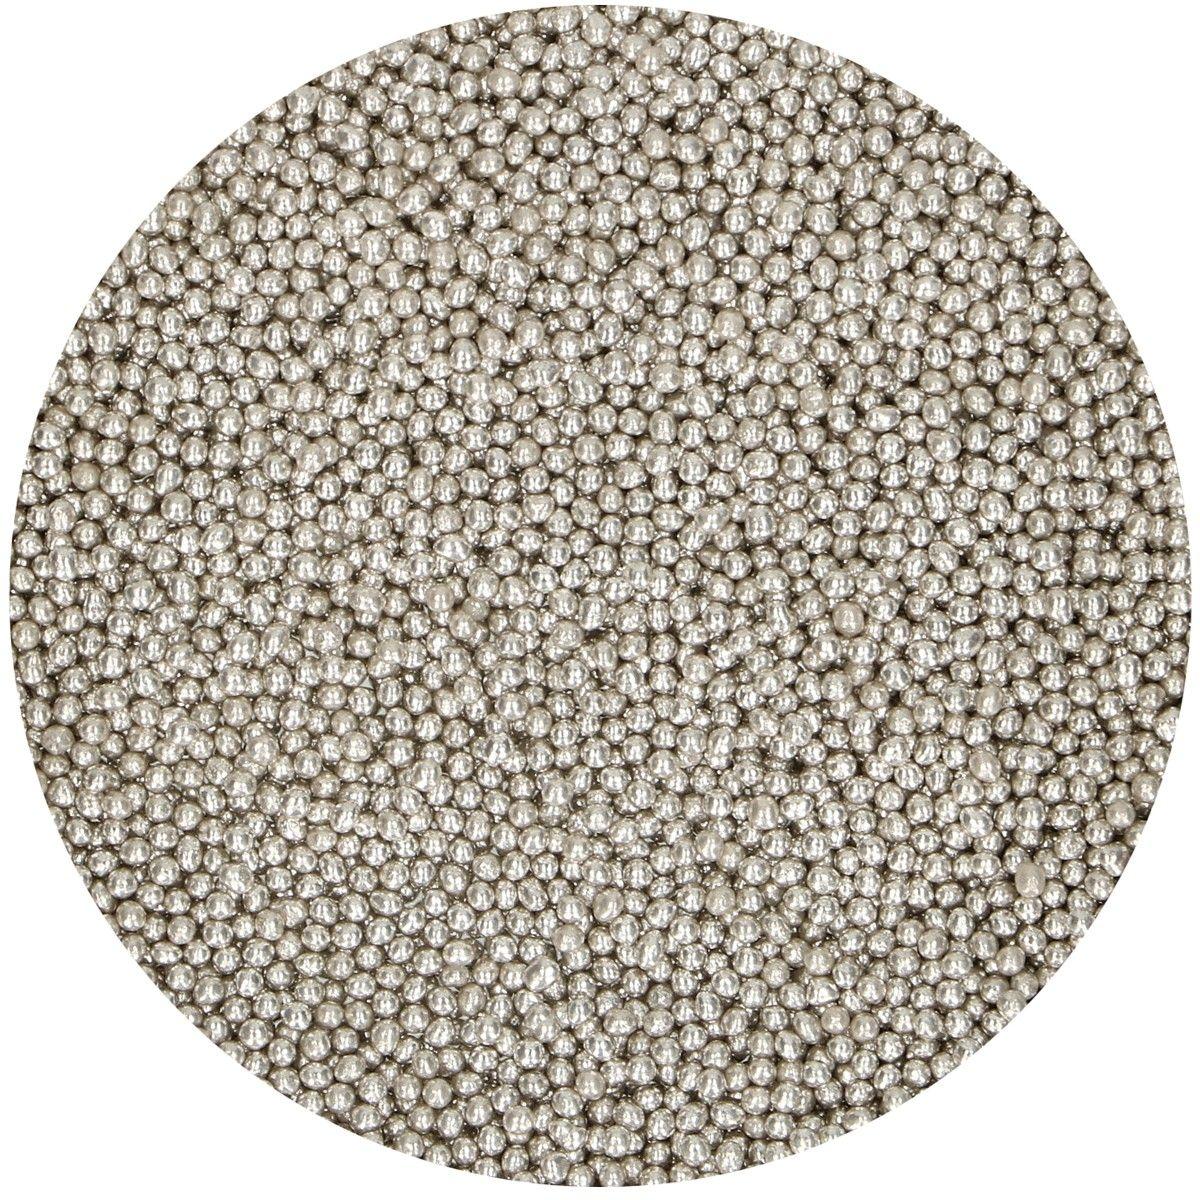 Perolas - Prateadas 2mm 80gr